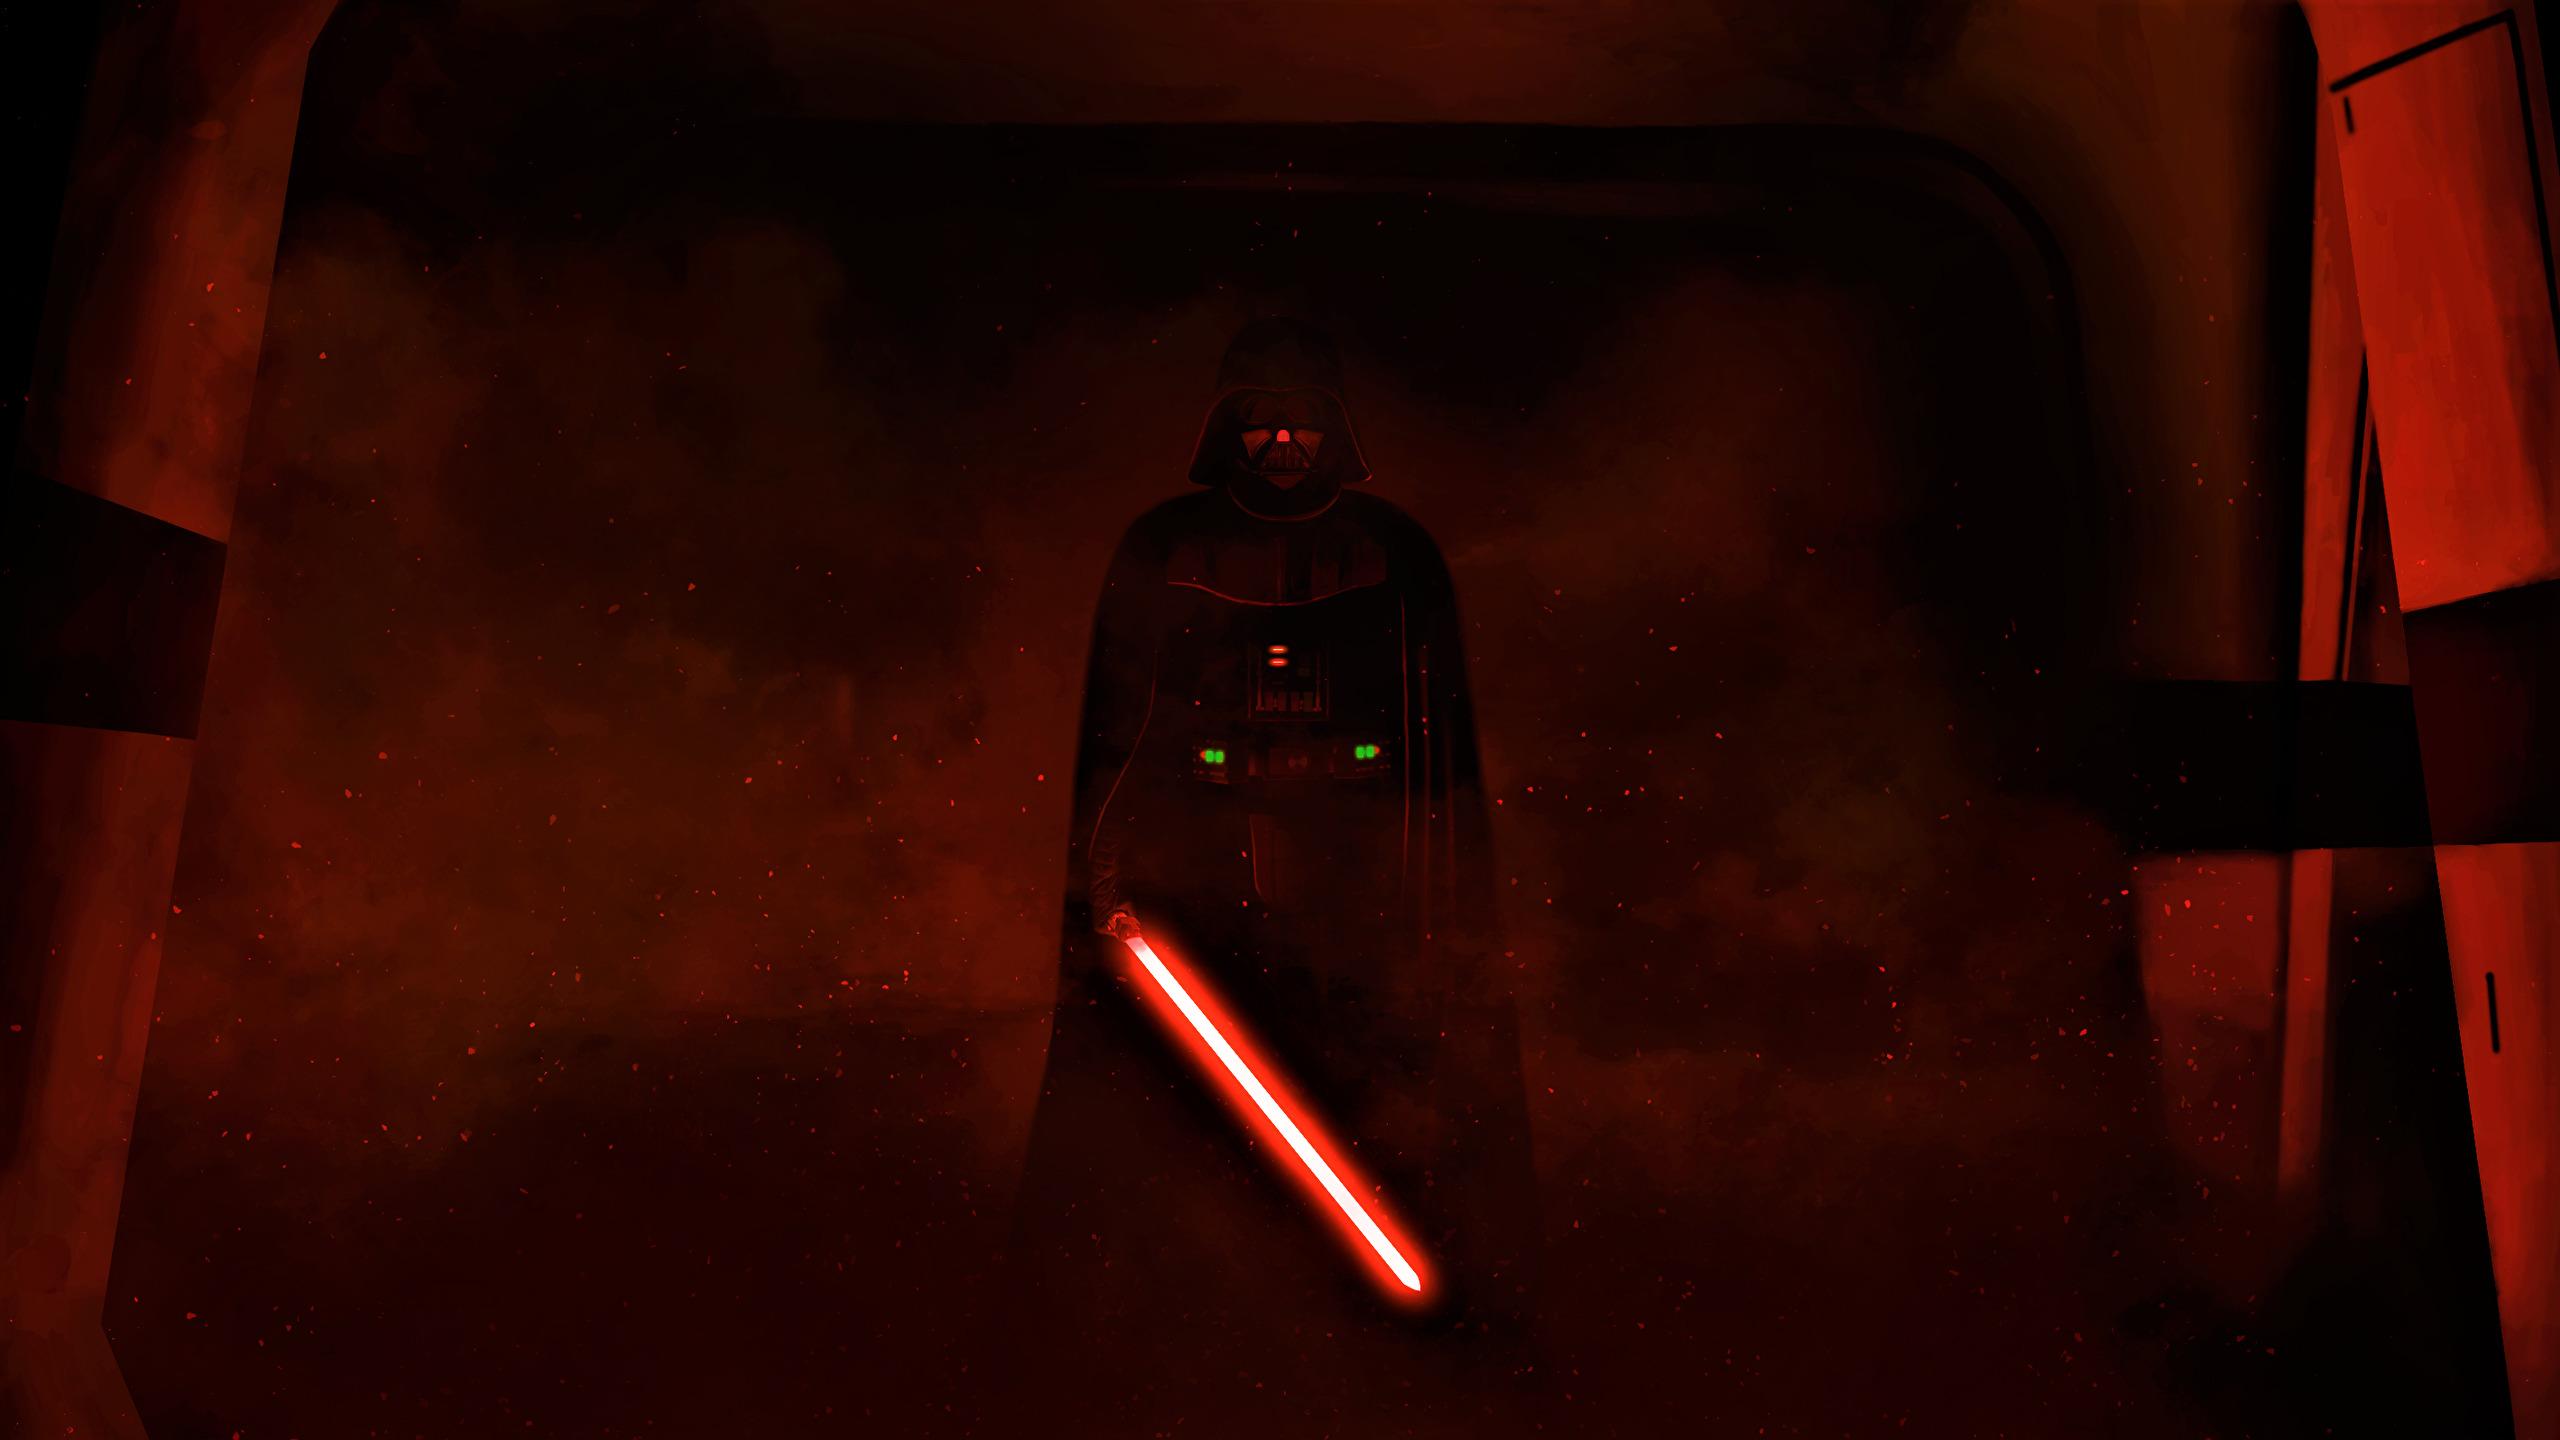 Star Wars Wallpaper Darth Vader 2560x1440 Download Hd Wallpaper Wallpapertip